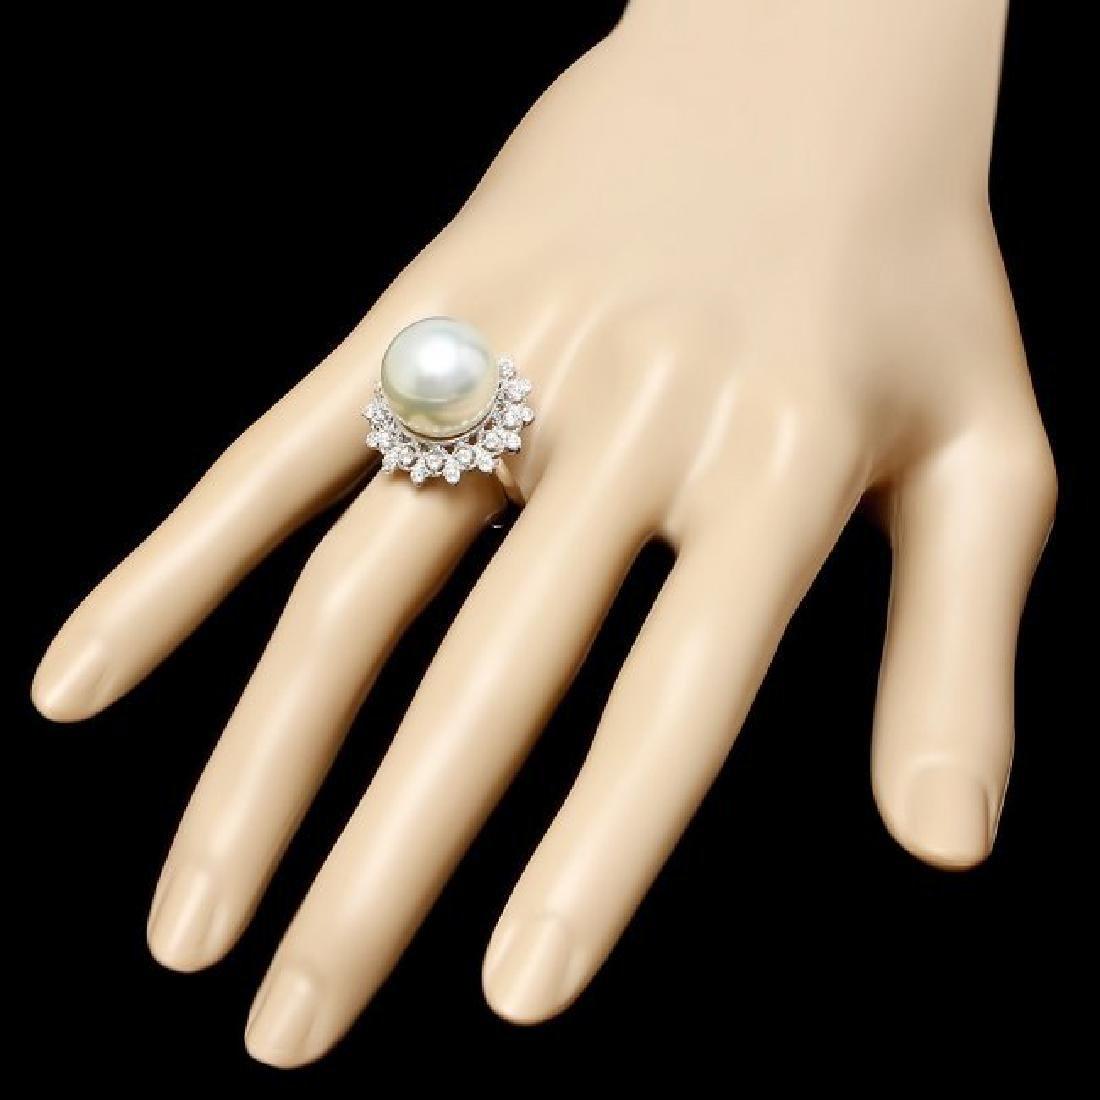 14k Gold 14 X 14mm Pearl 0.60ct Diamond Ring - 3